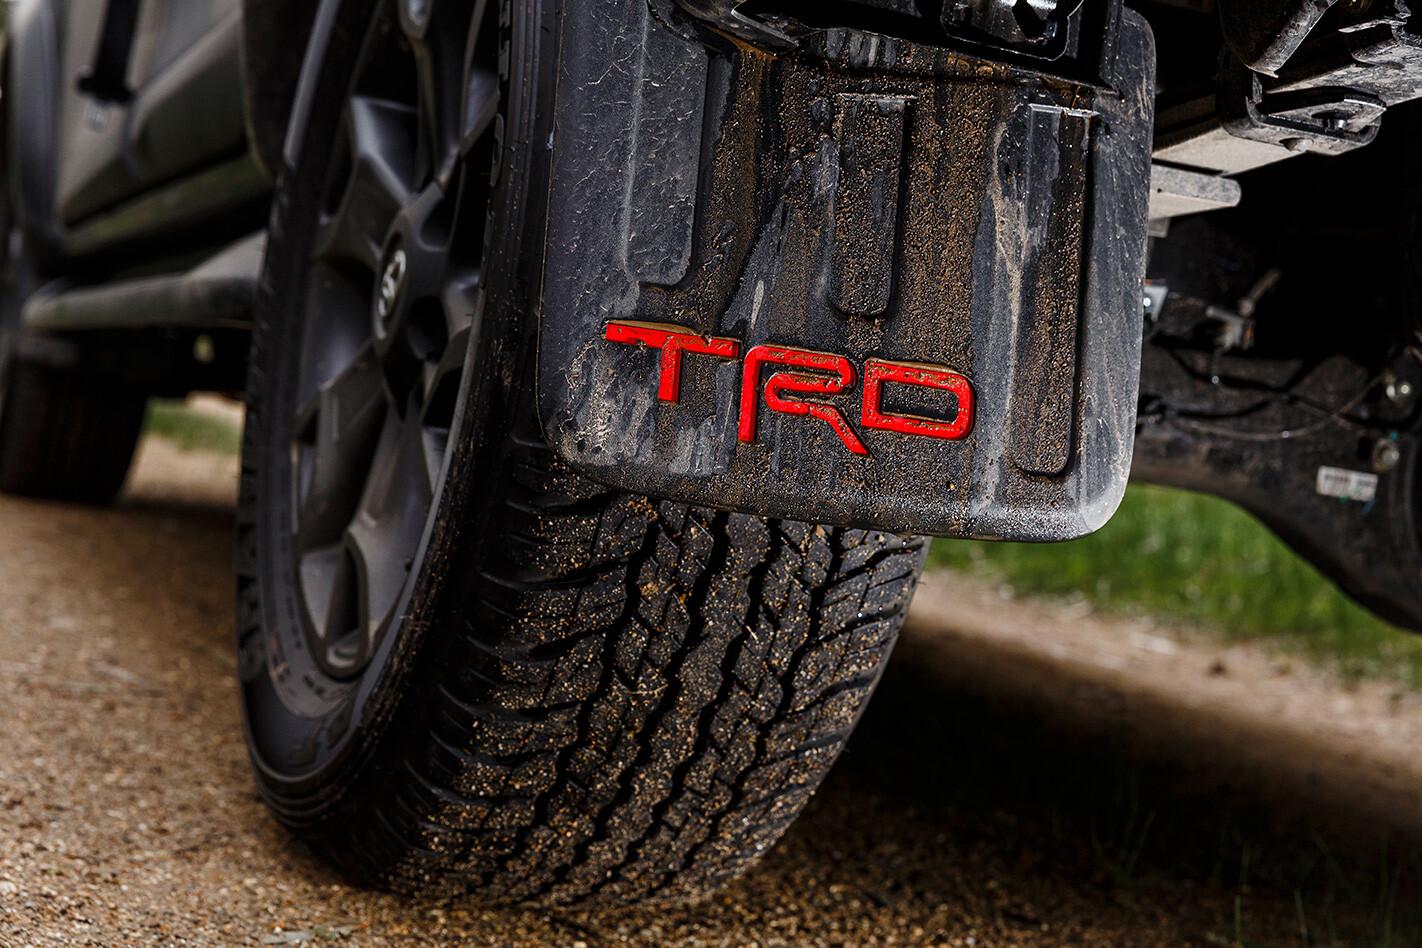 Toyota Hilux TRD mud flaps.jpg